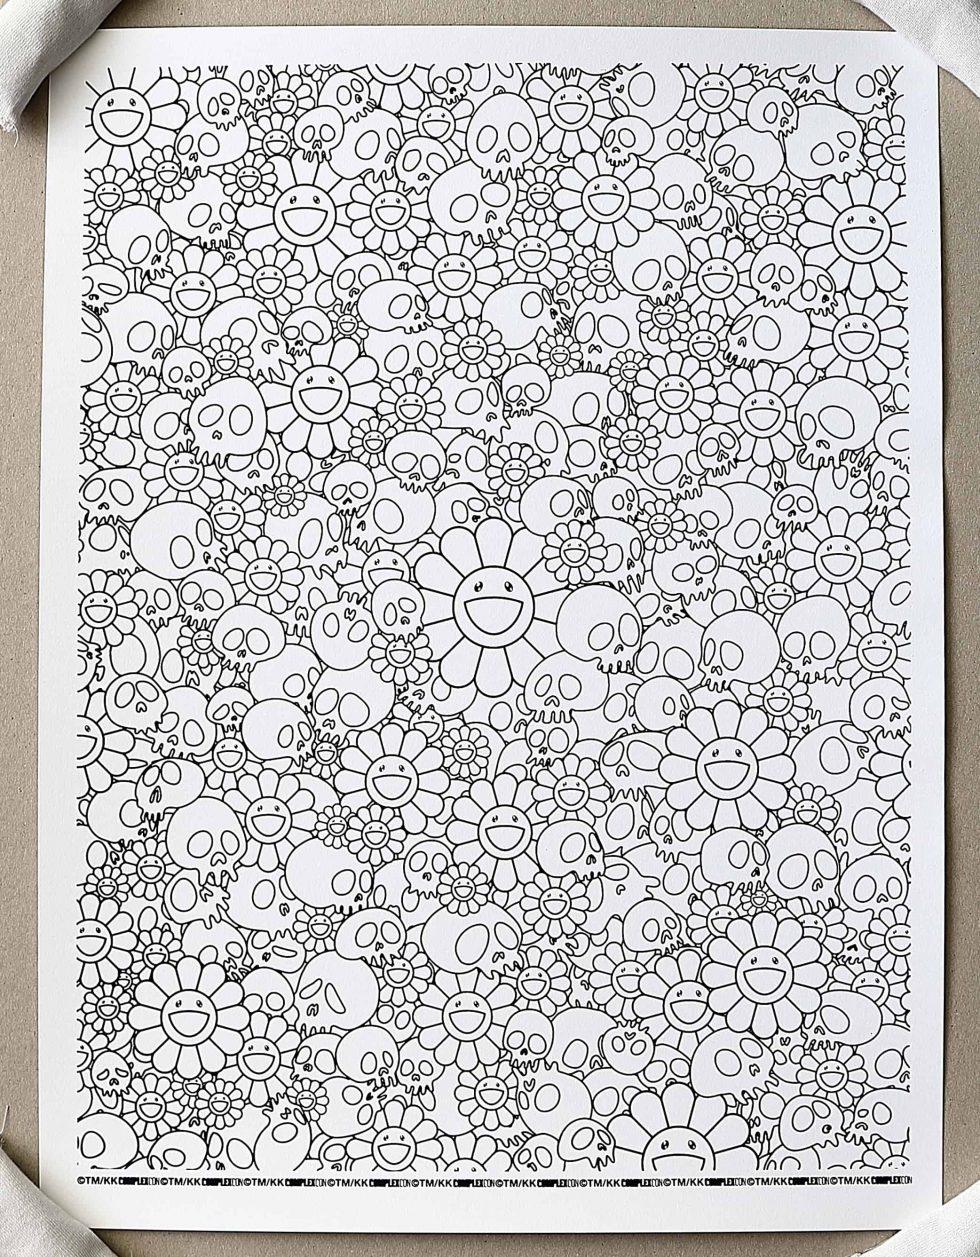 Lot #9500 – Takashi Murakami Skulls & Flower x ComplexCon Print Art [tag]